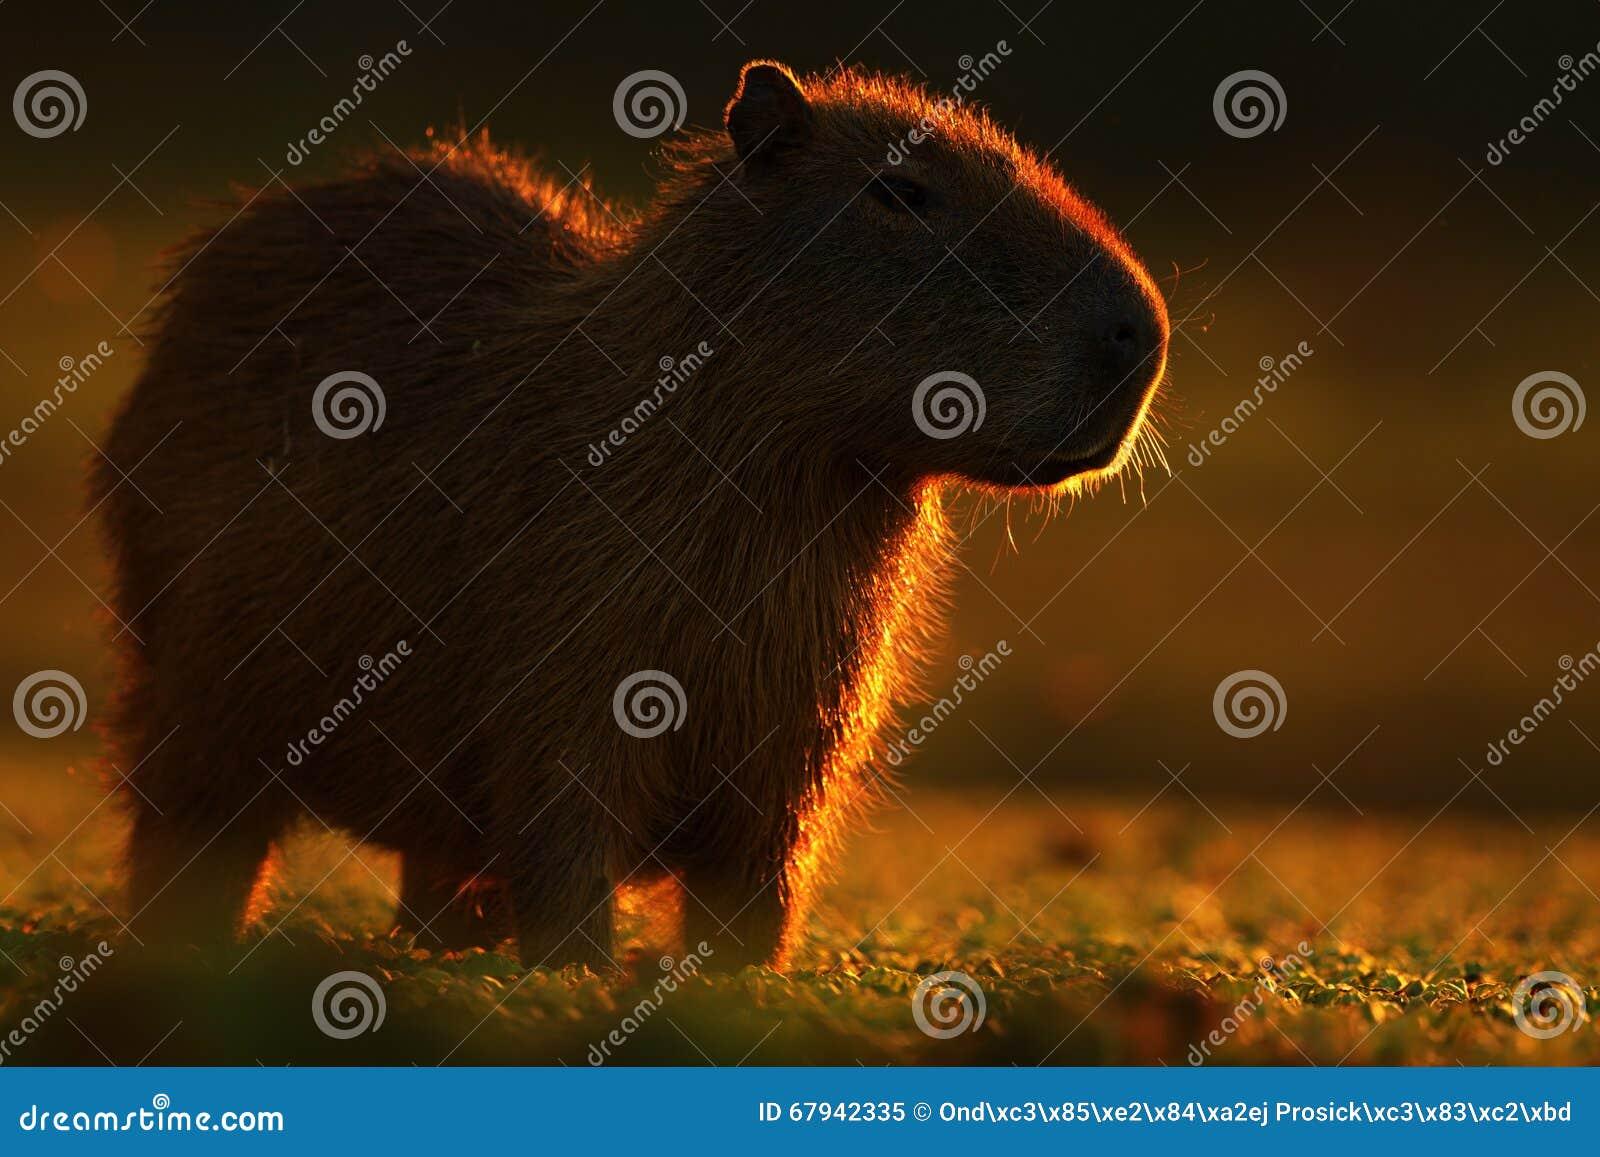 Biggest mouse around the world, Capybara, Hydrochoerus hydrochaeris, with evening light during sunset, Pantanal, Brazil